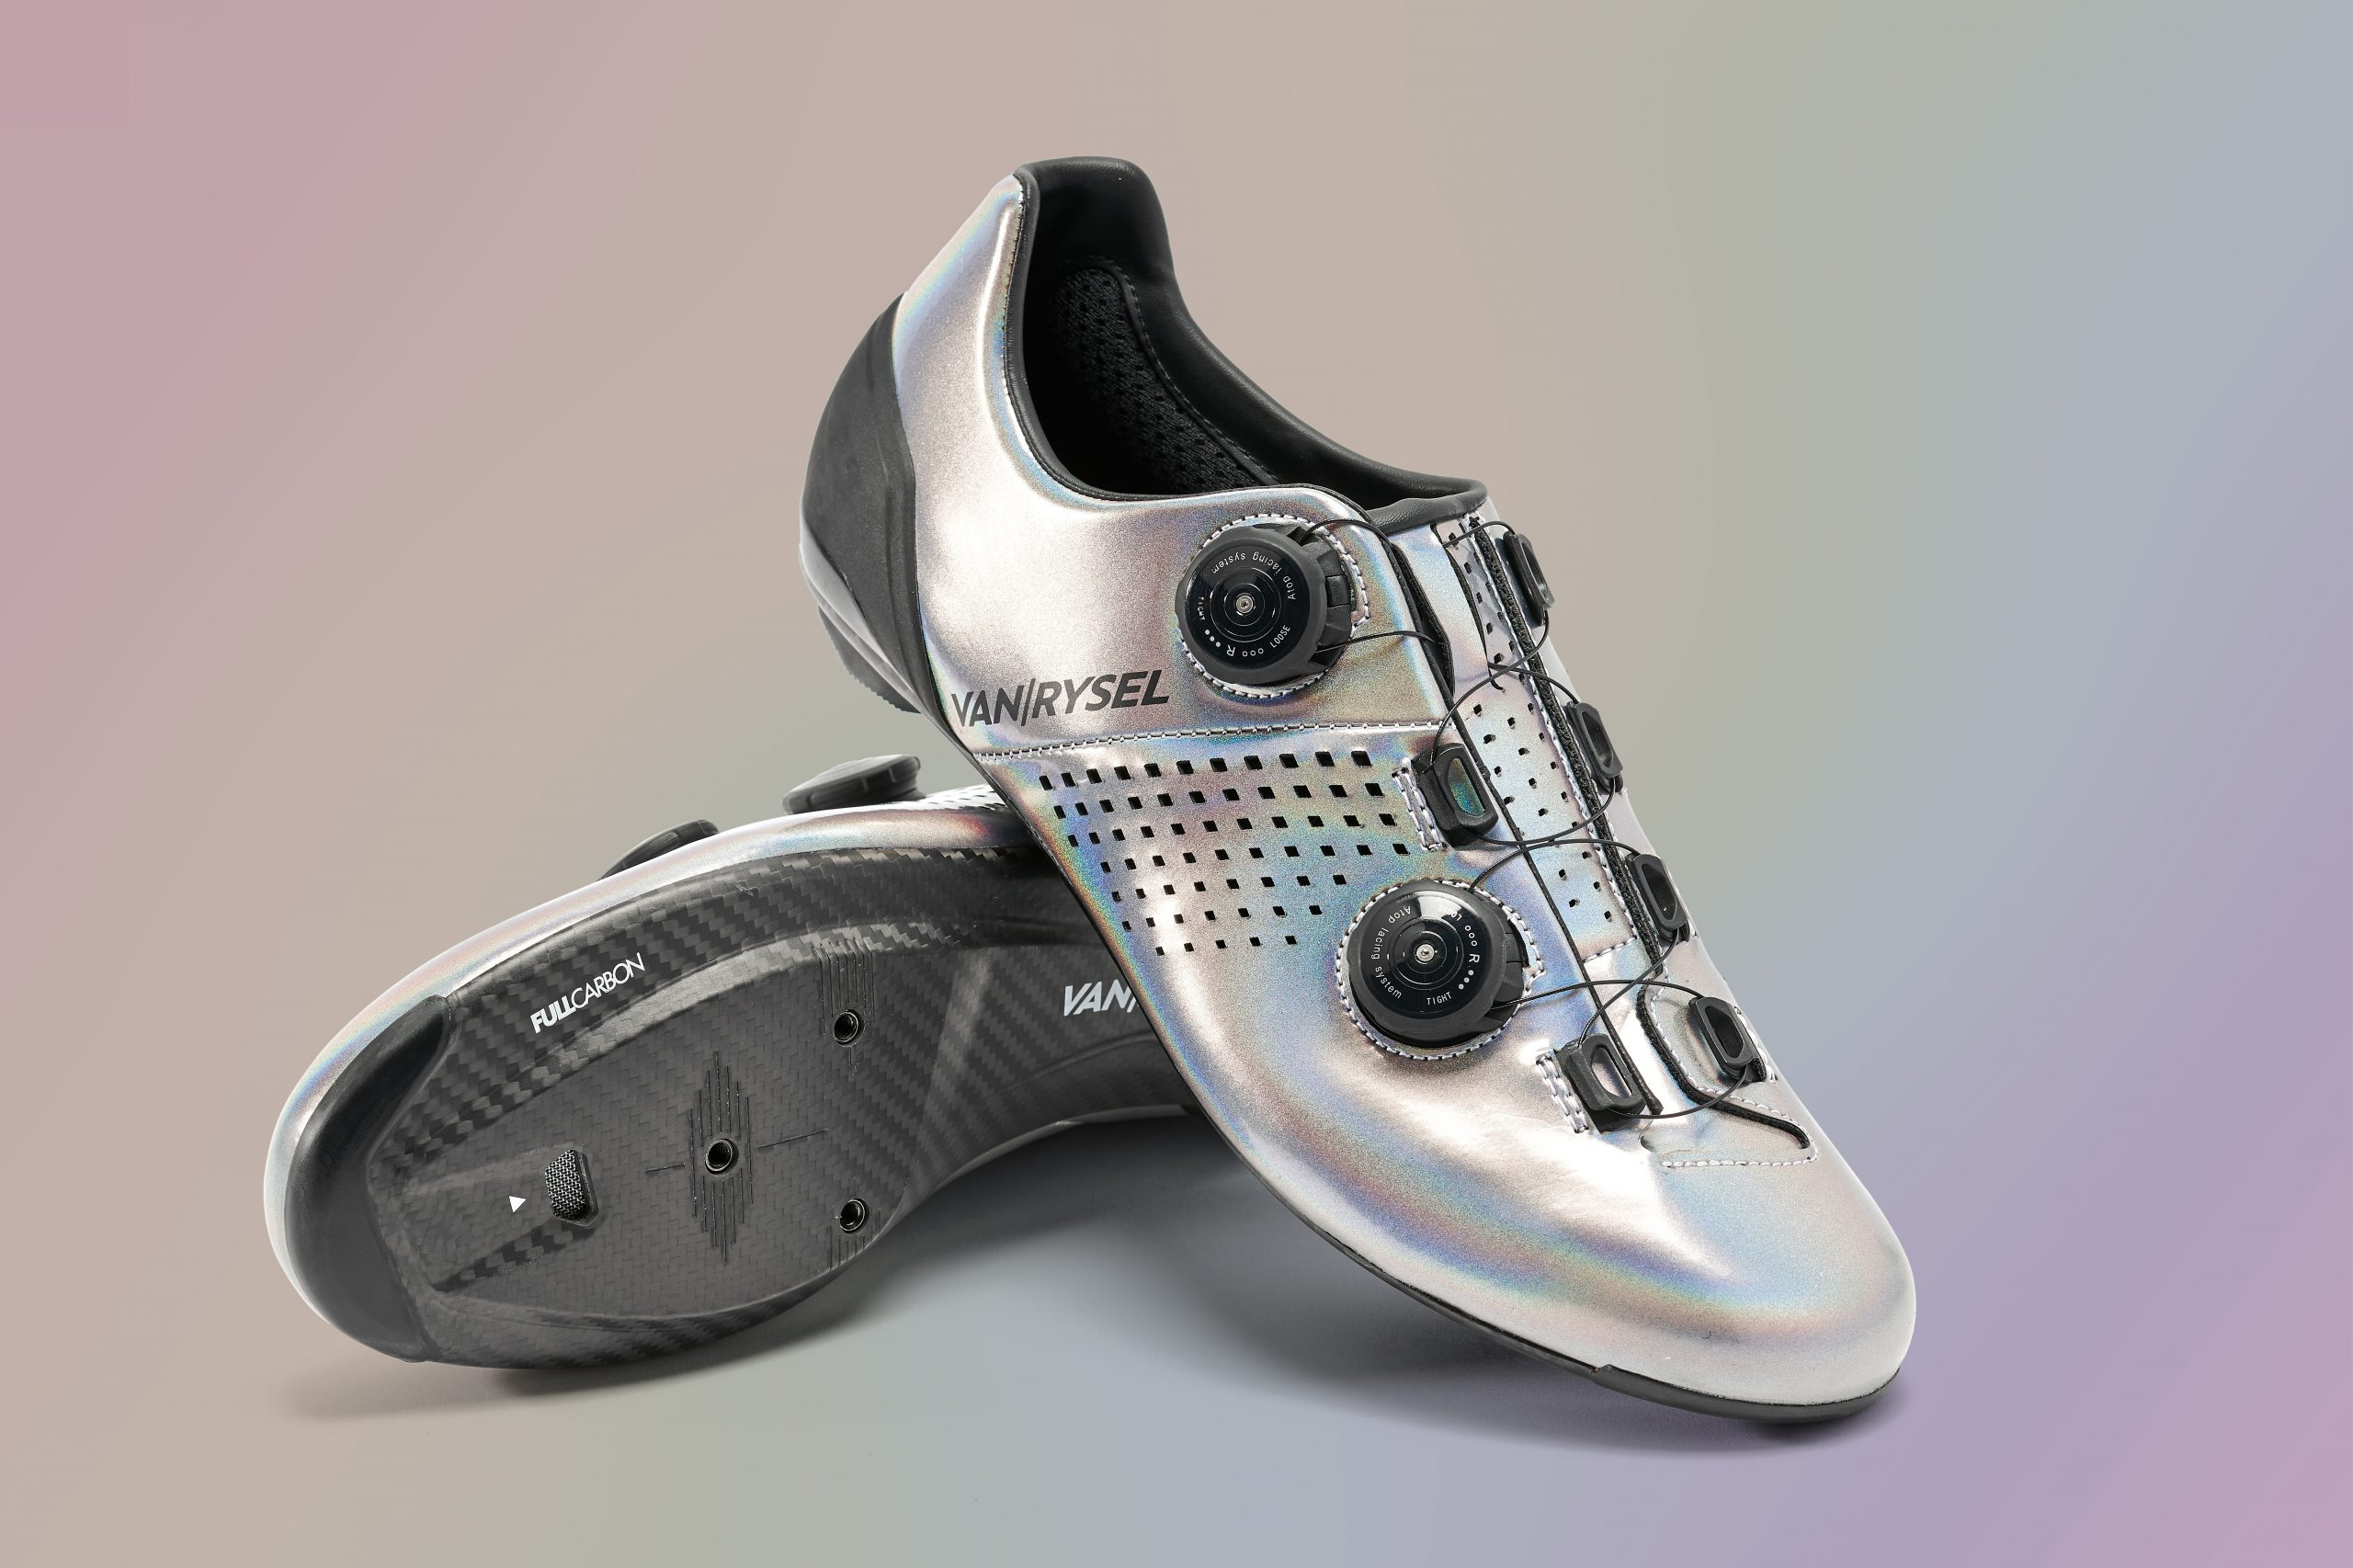 Van Rysel RR 900 carbon bike shoes review - Bike shoes - Bike ...